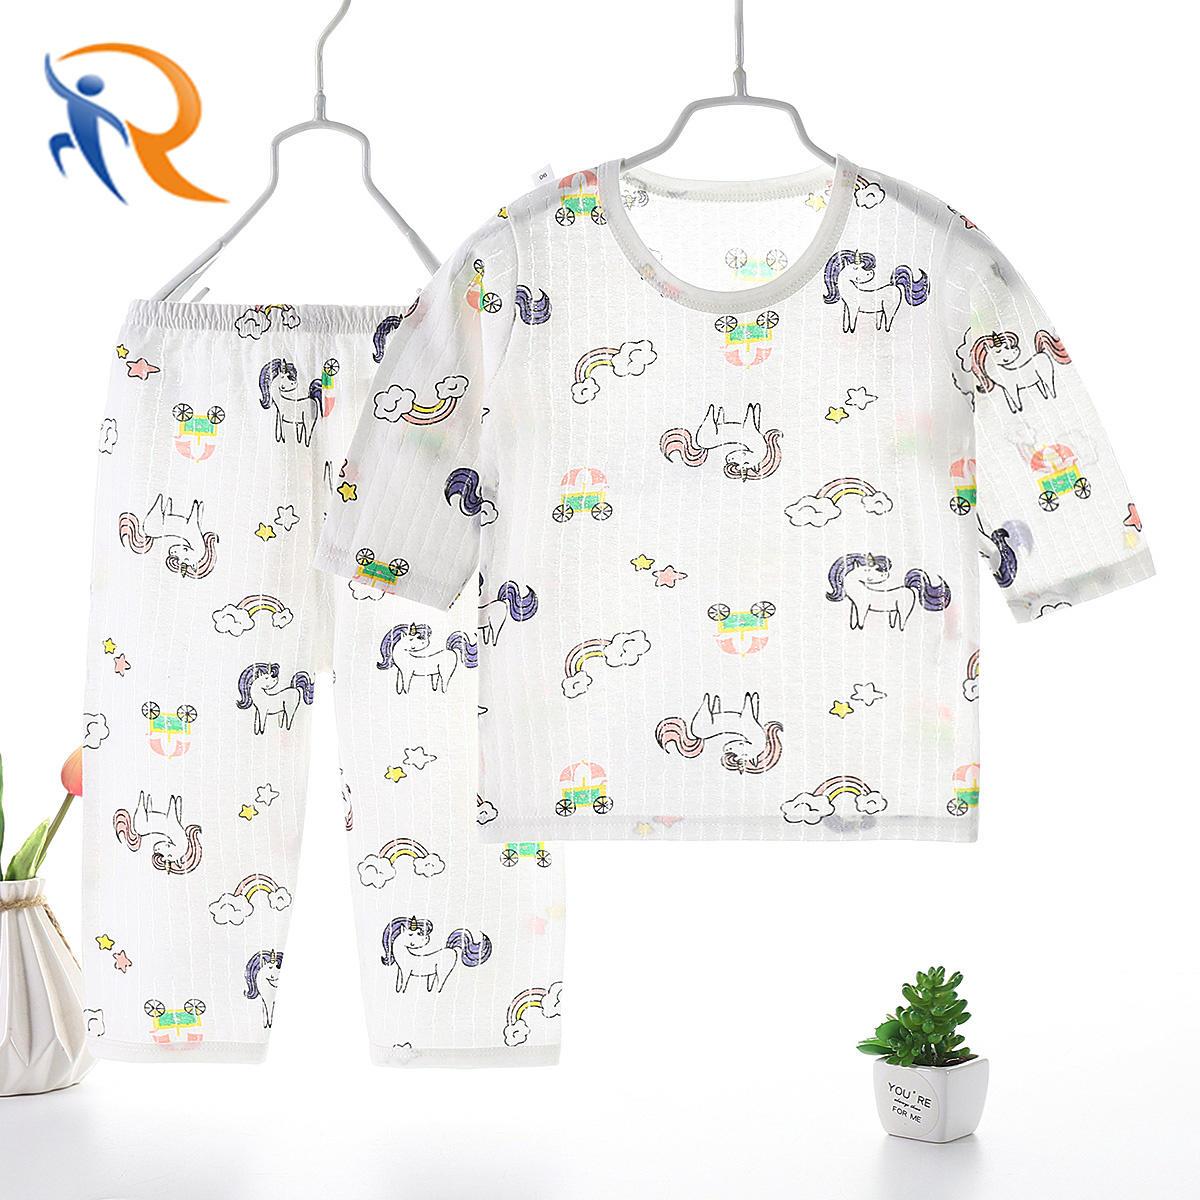 2021 Fashion New Summer Children′s Air Conditioning Pajamas Set Thin Cartoon baby Cotton Homewear